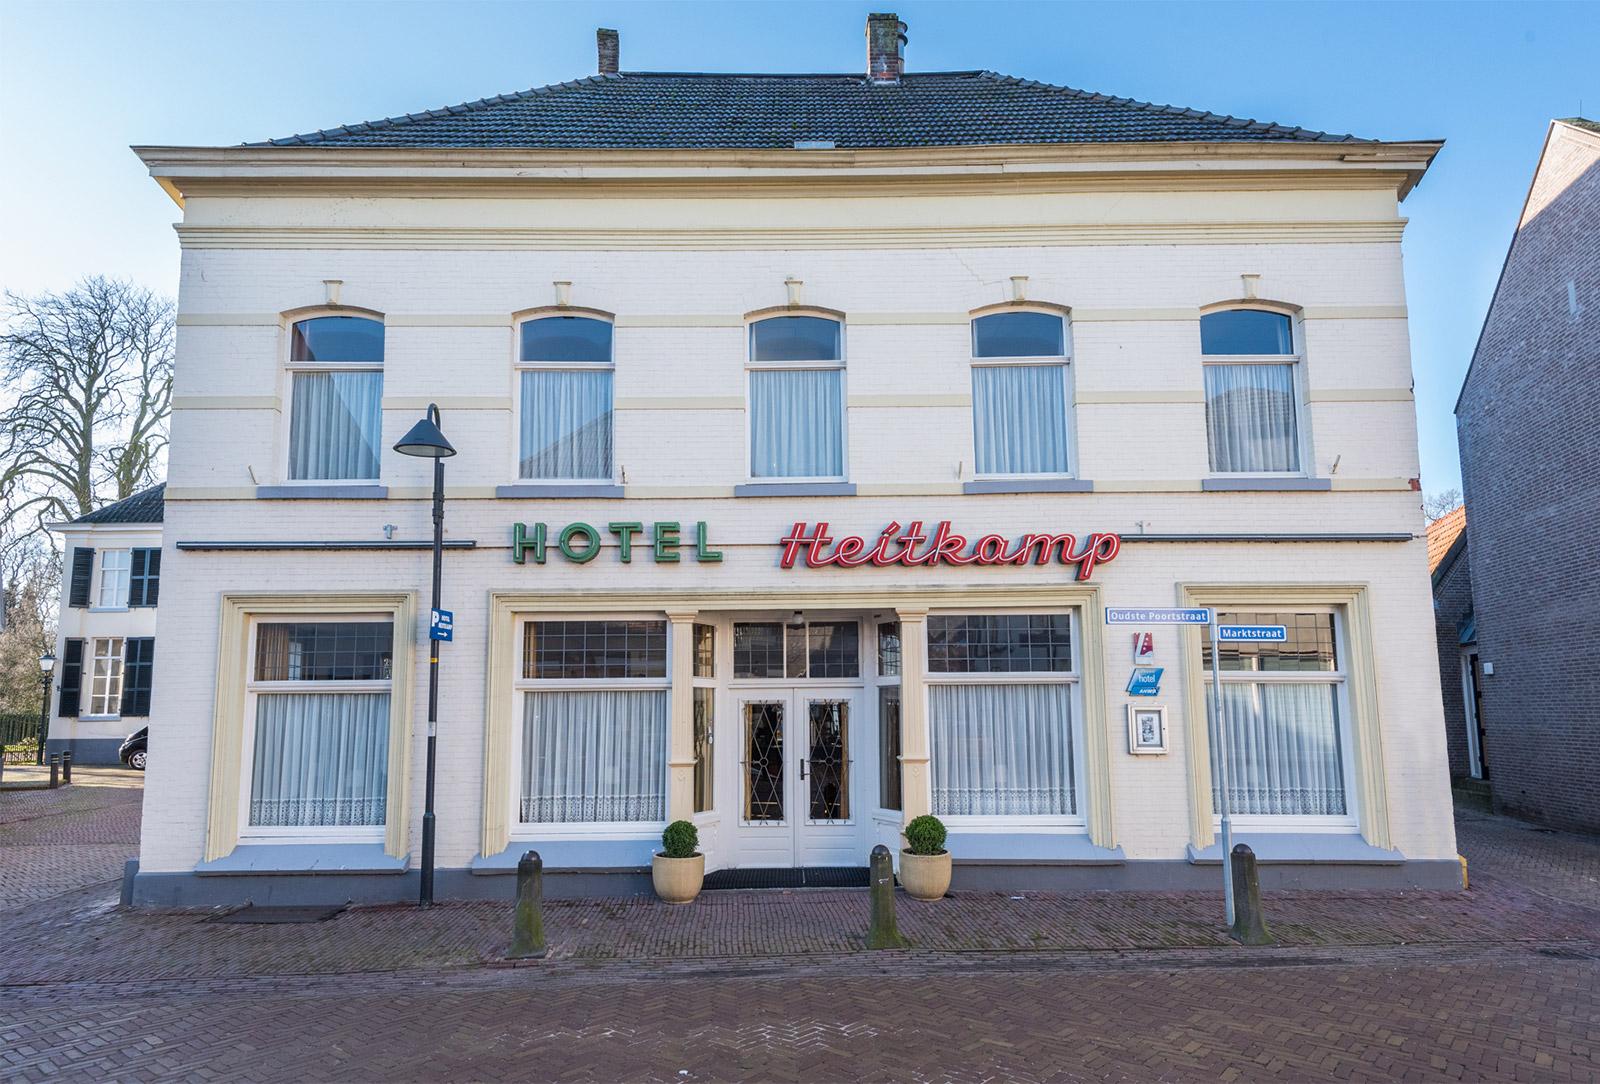 hotel-heitkamp-slide-1